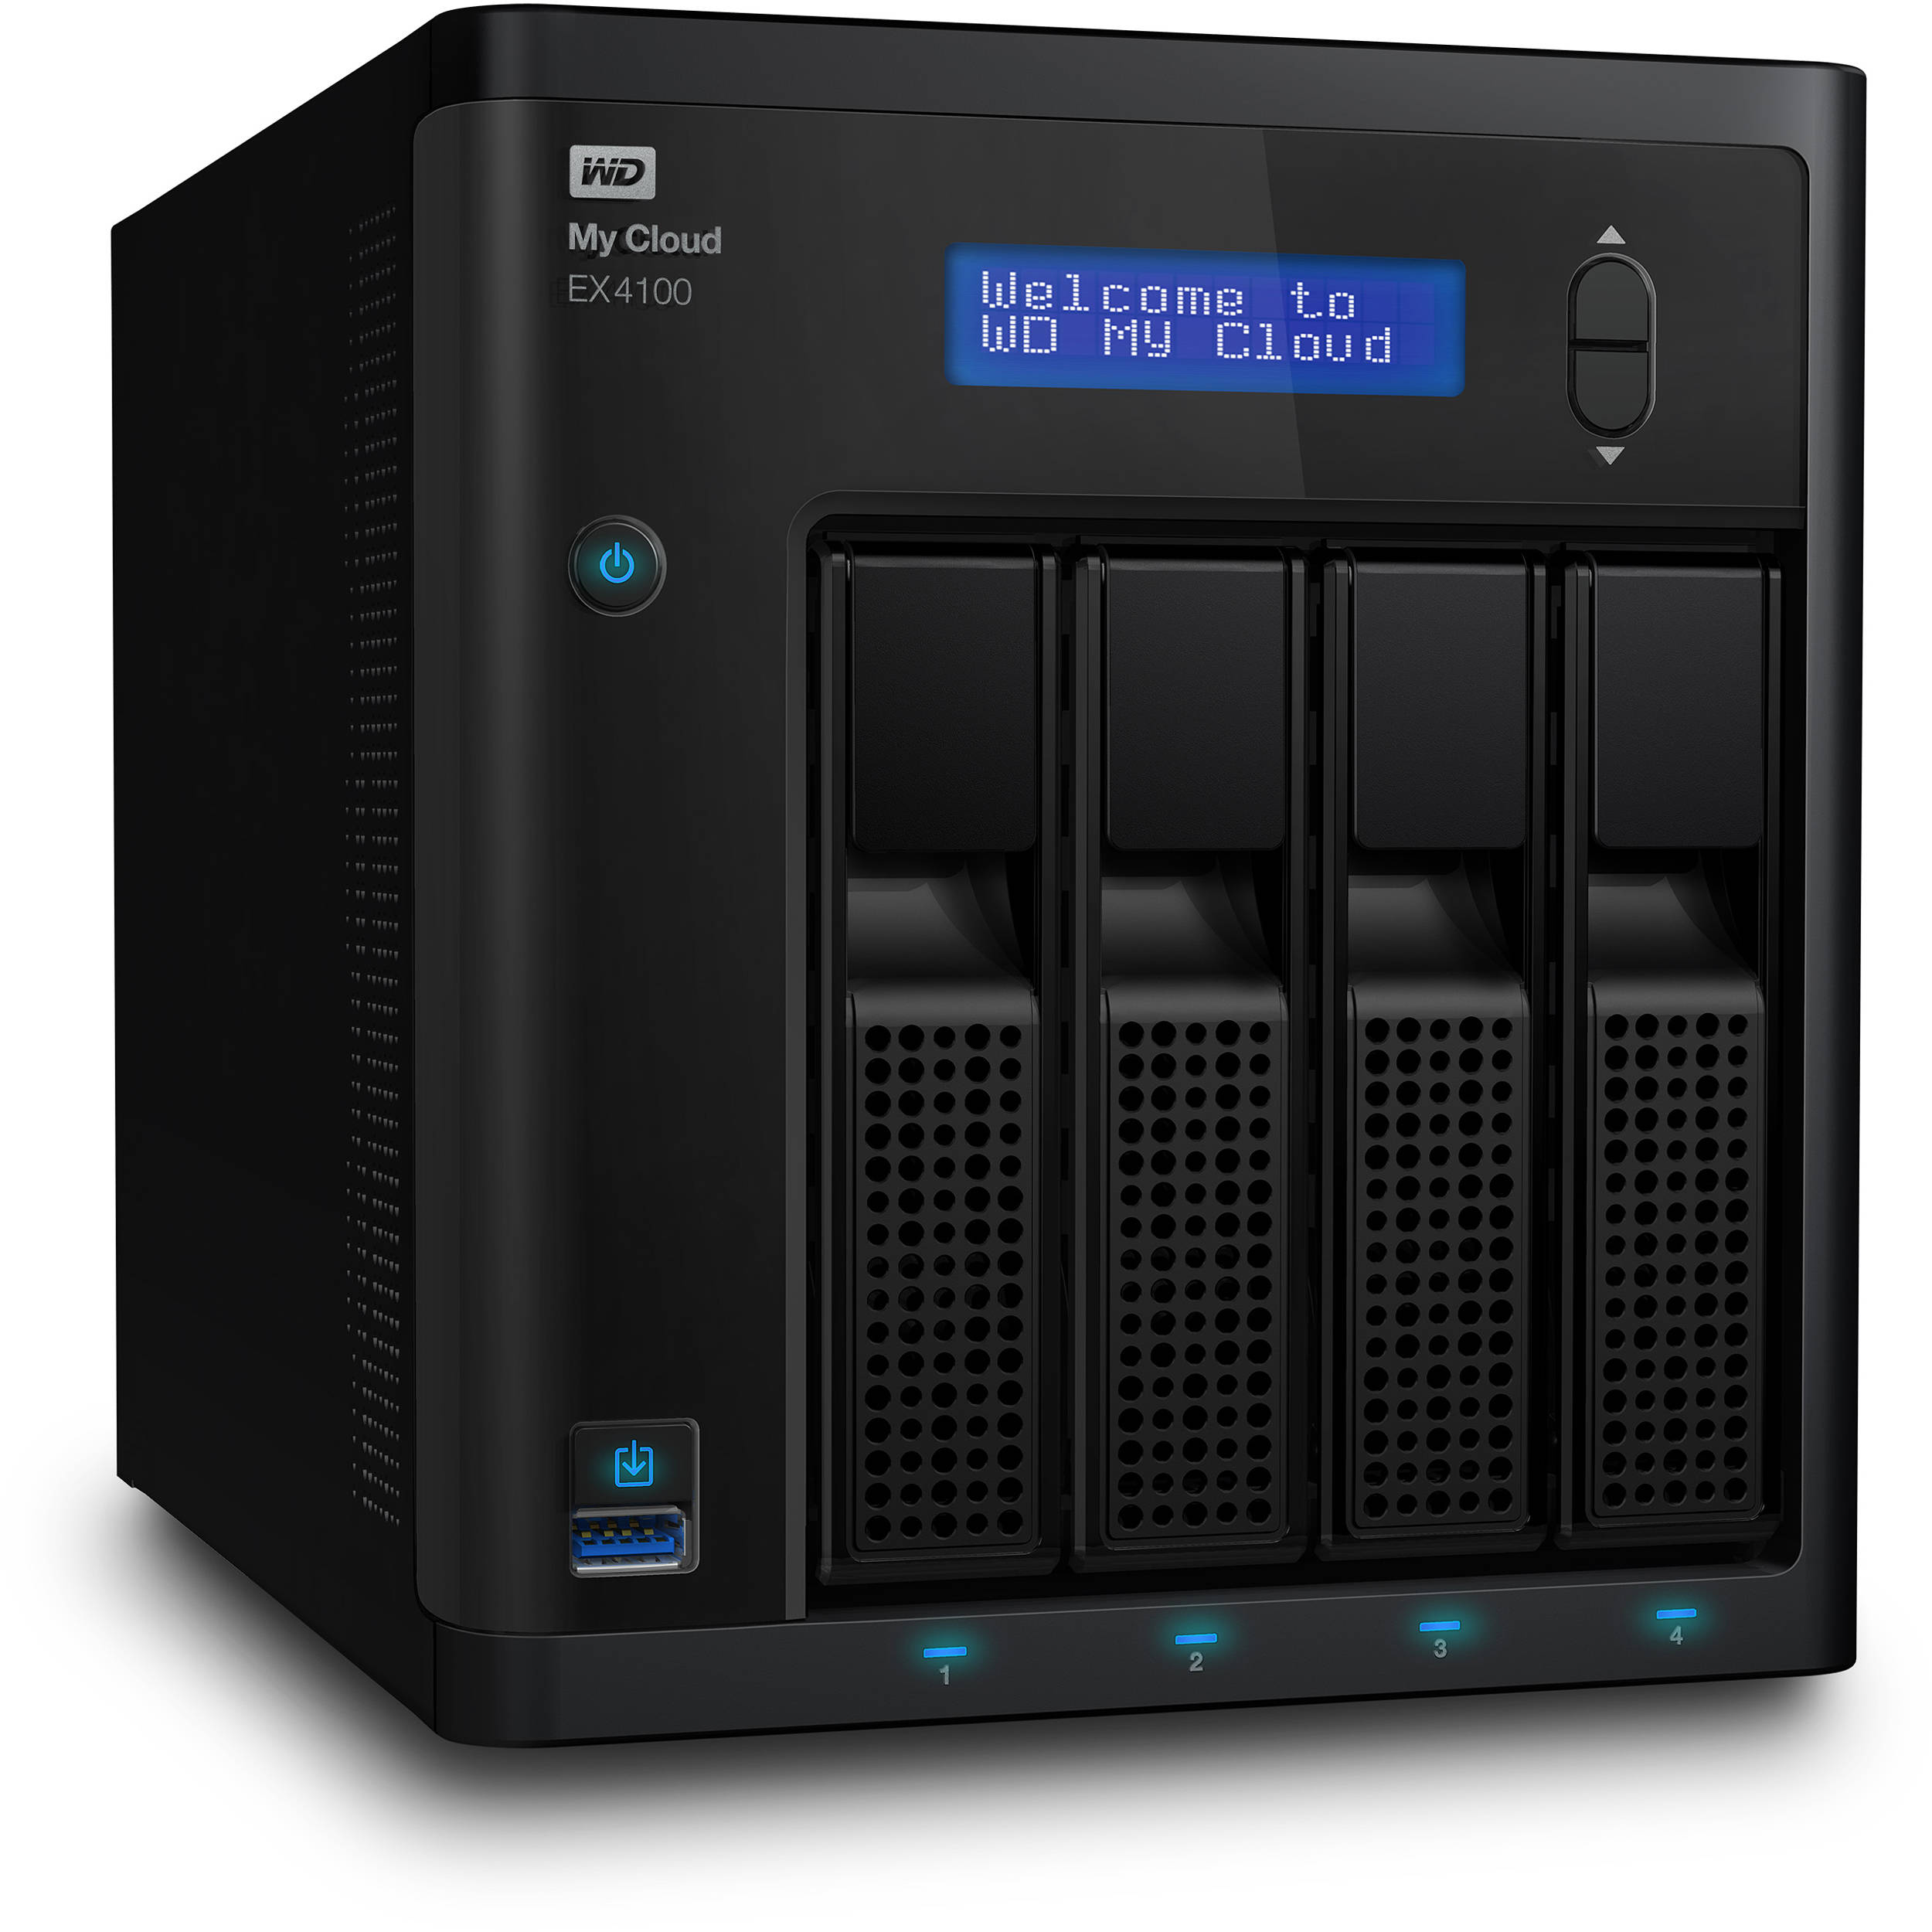 Wd My Cloud Expert Series Ex4100 8tb 4 Bay Nas